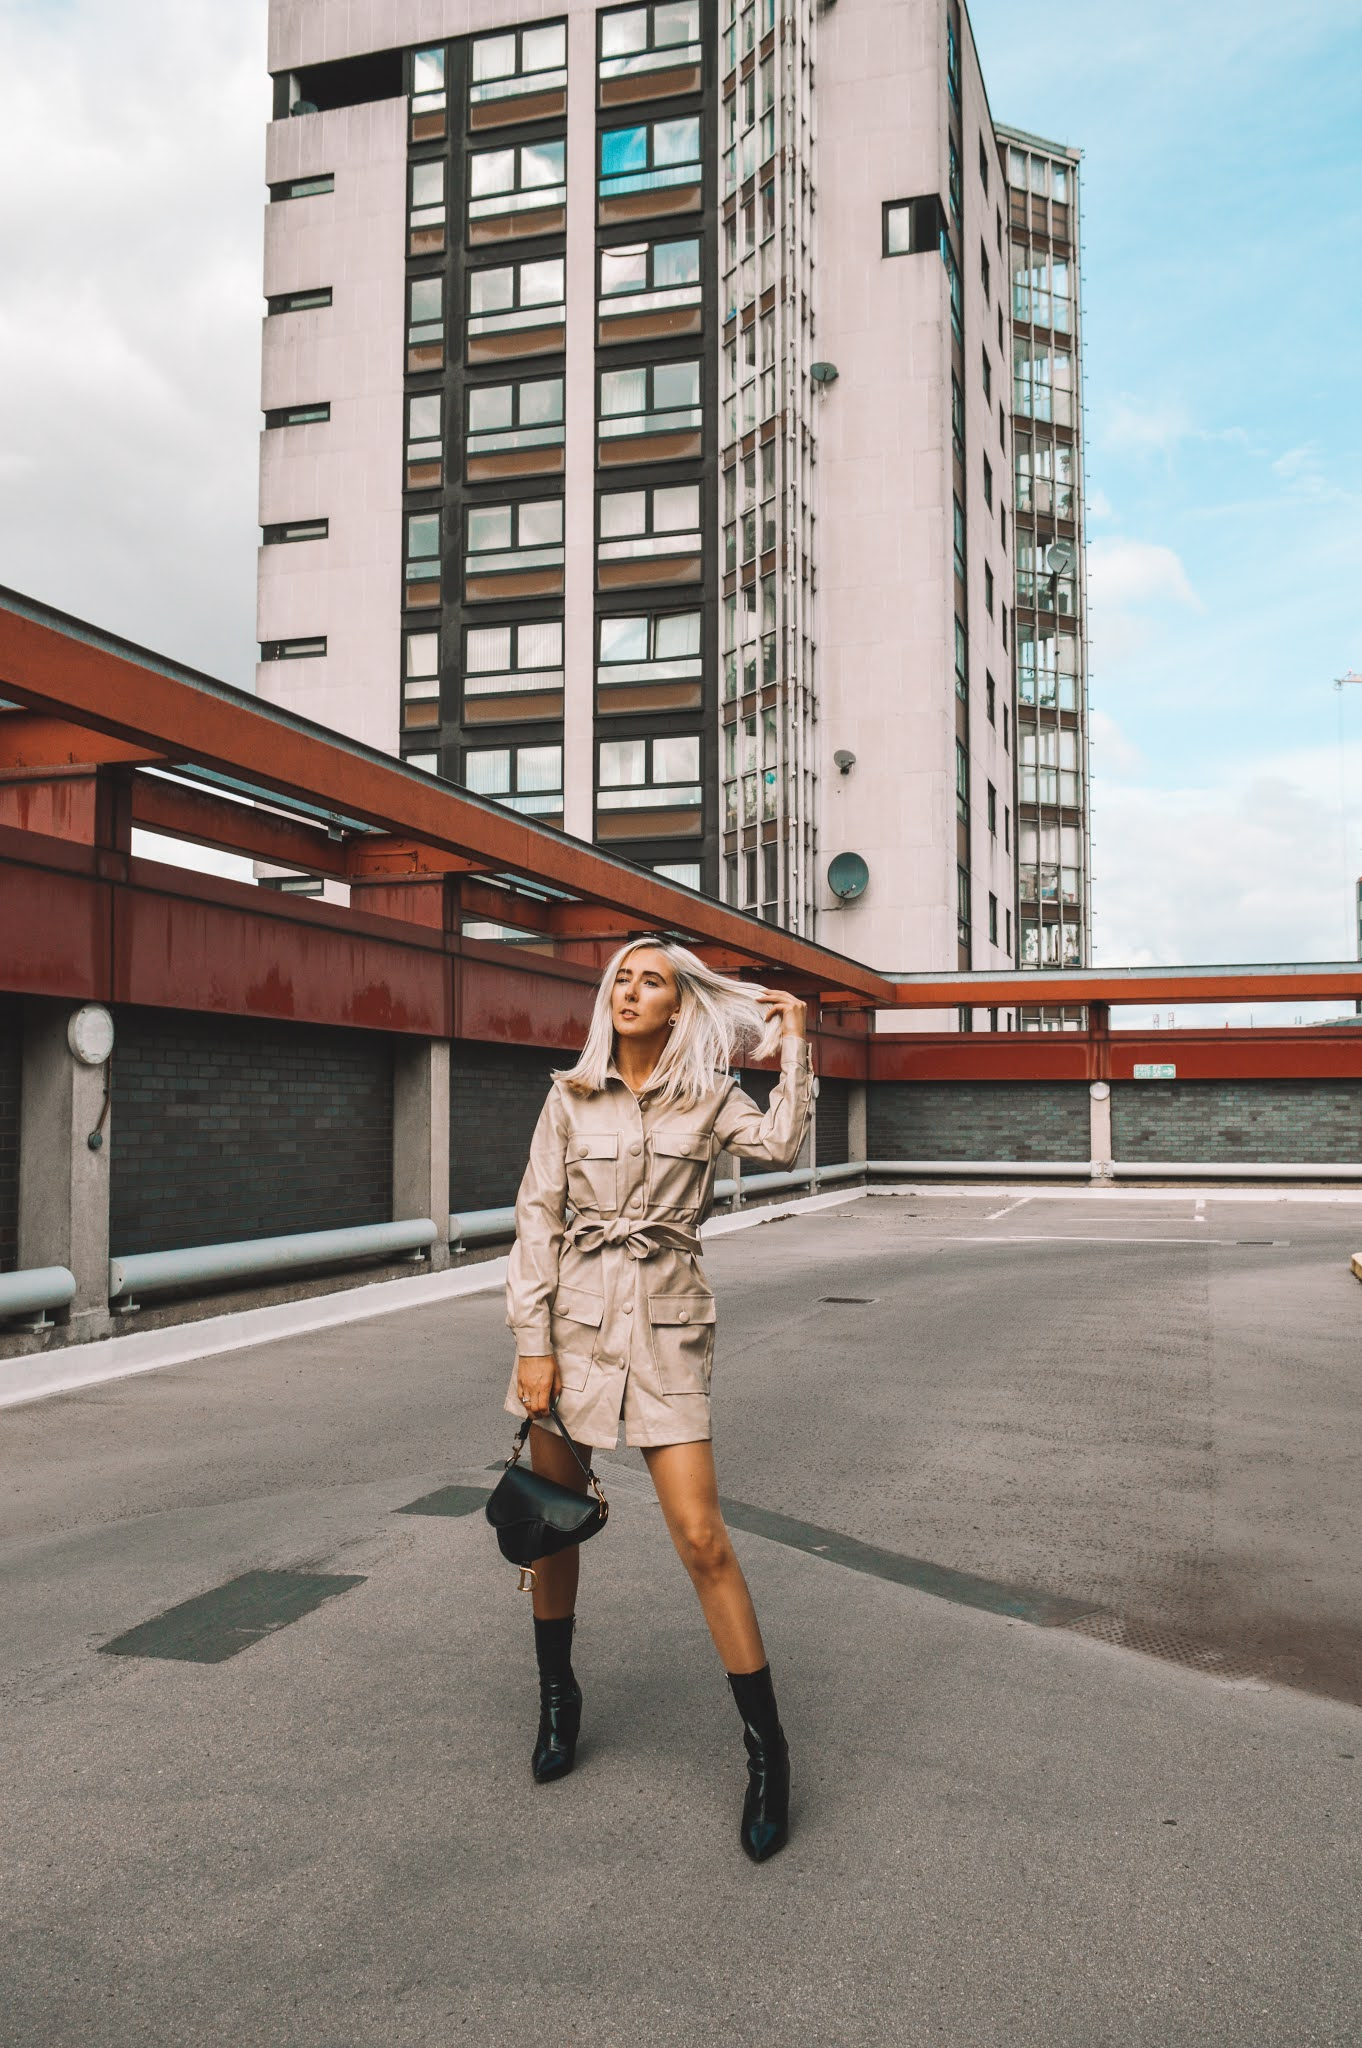 Best Instagram Spots In Coventry